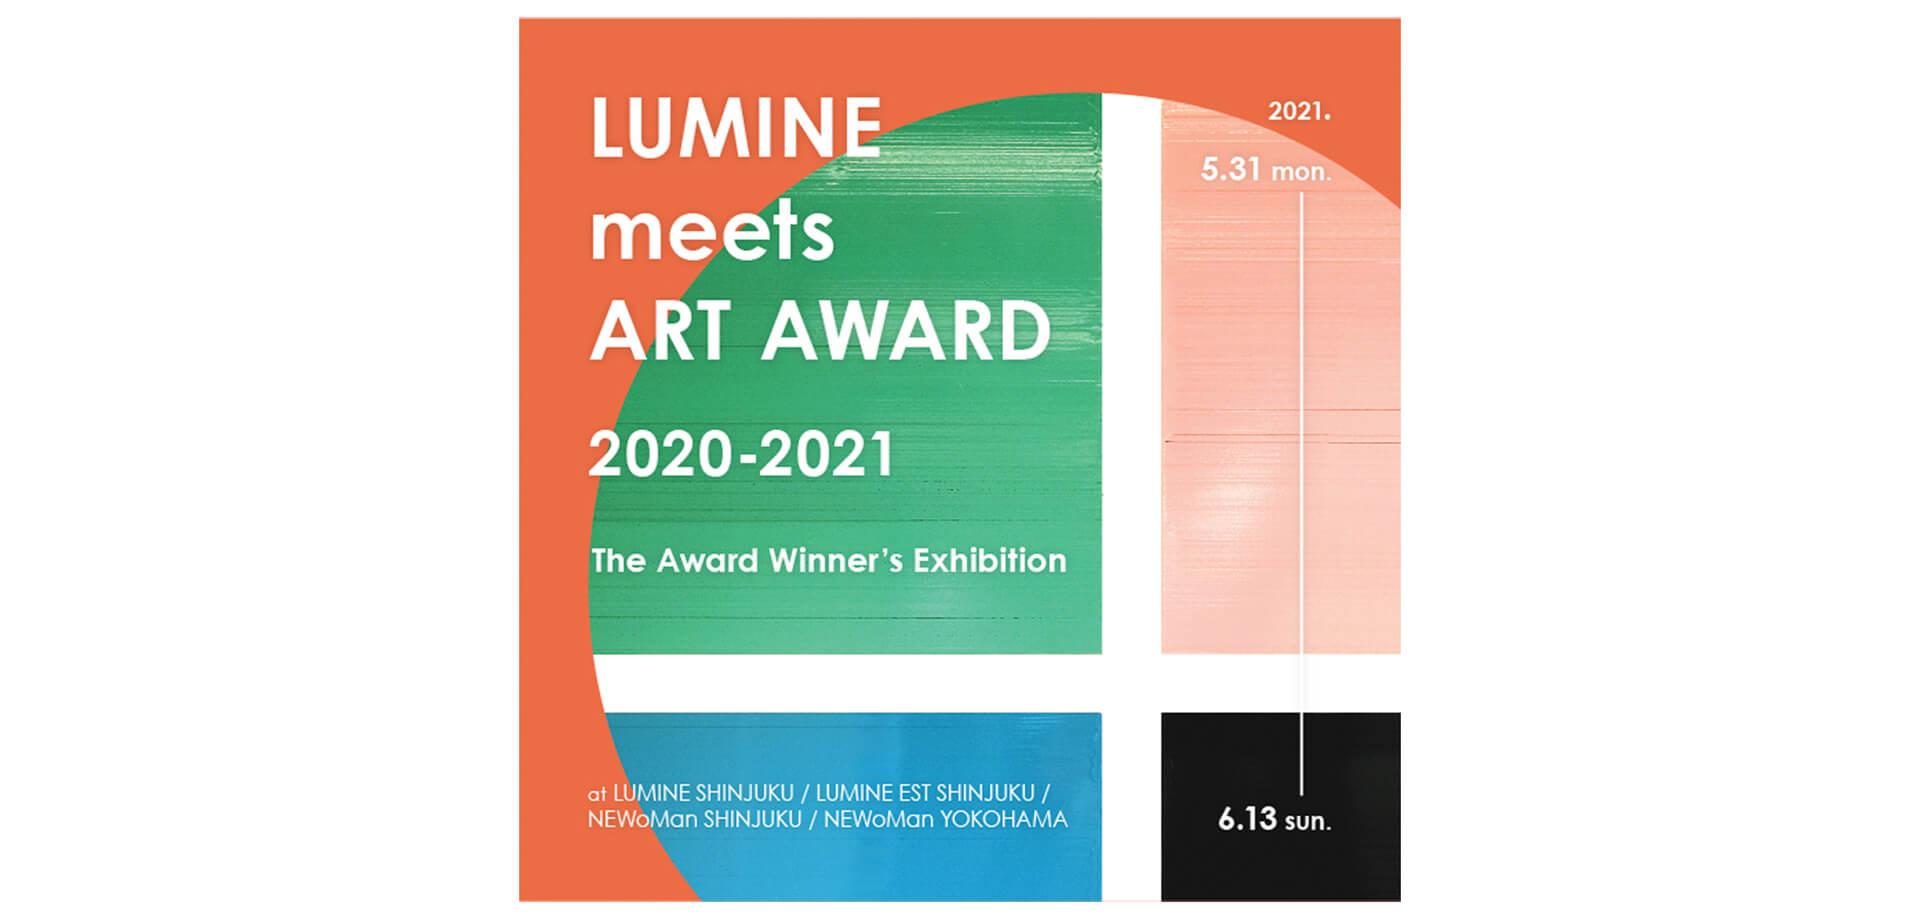 LUMINE meets ART AWARD 2020-2021 The Award Winner's Exhibition